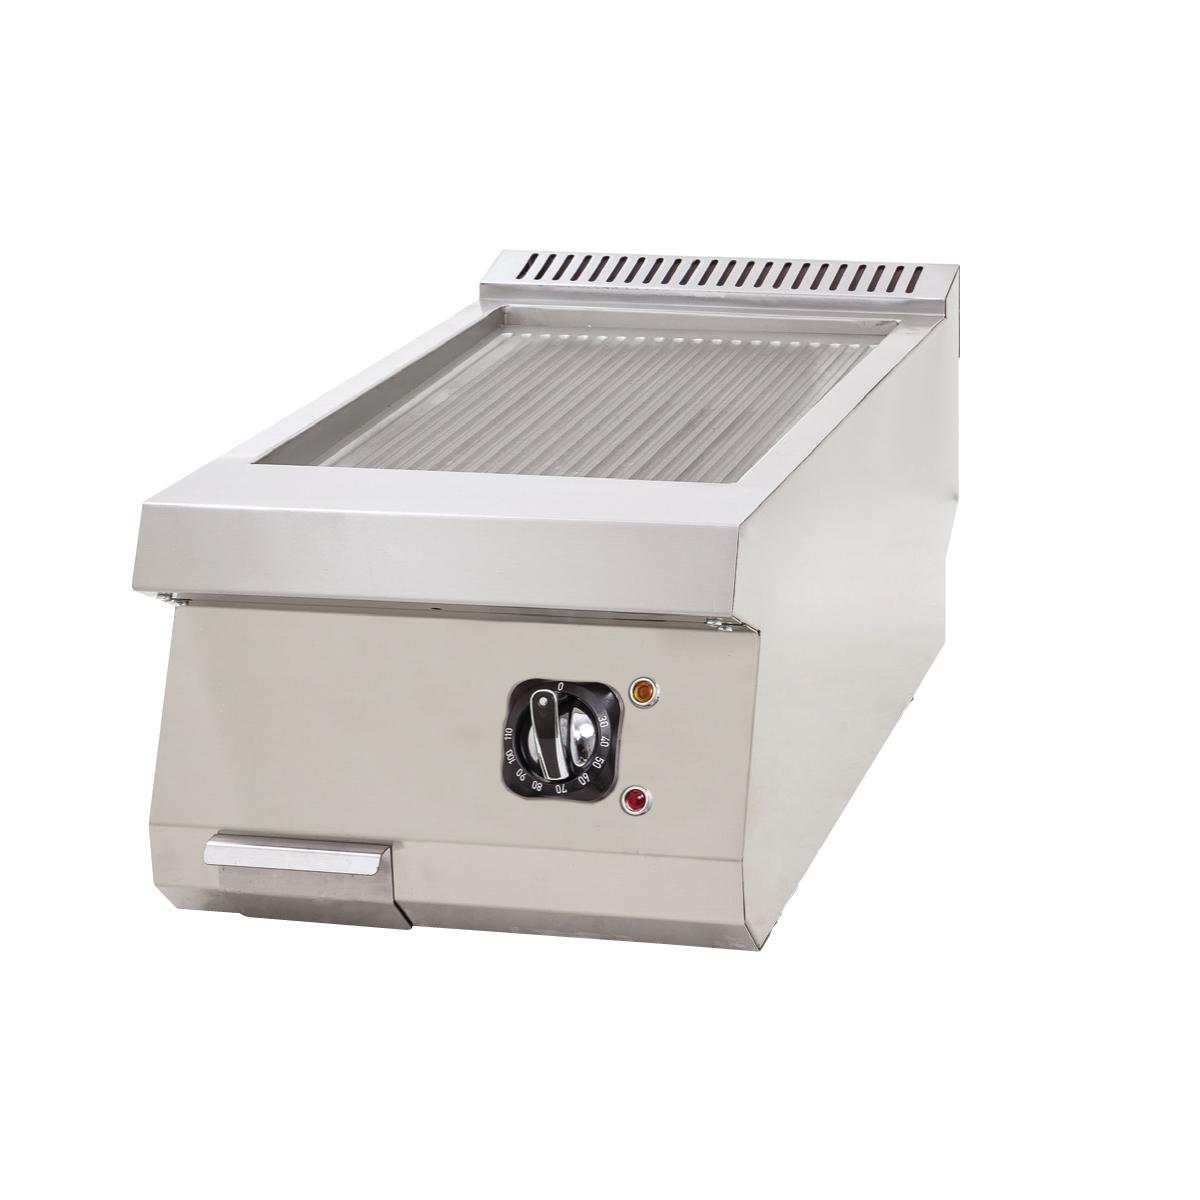 Electric Grill Flat - 40x70